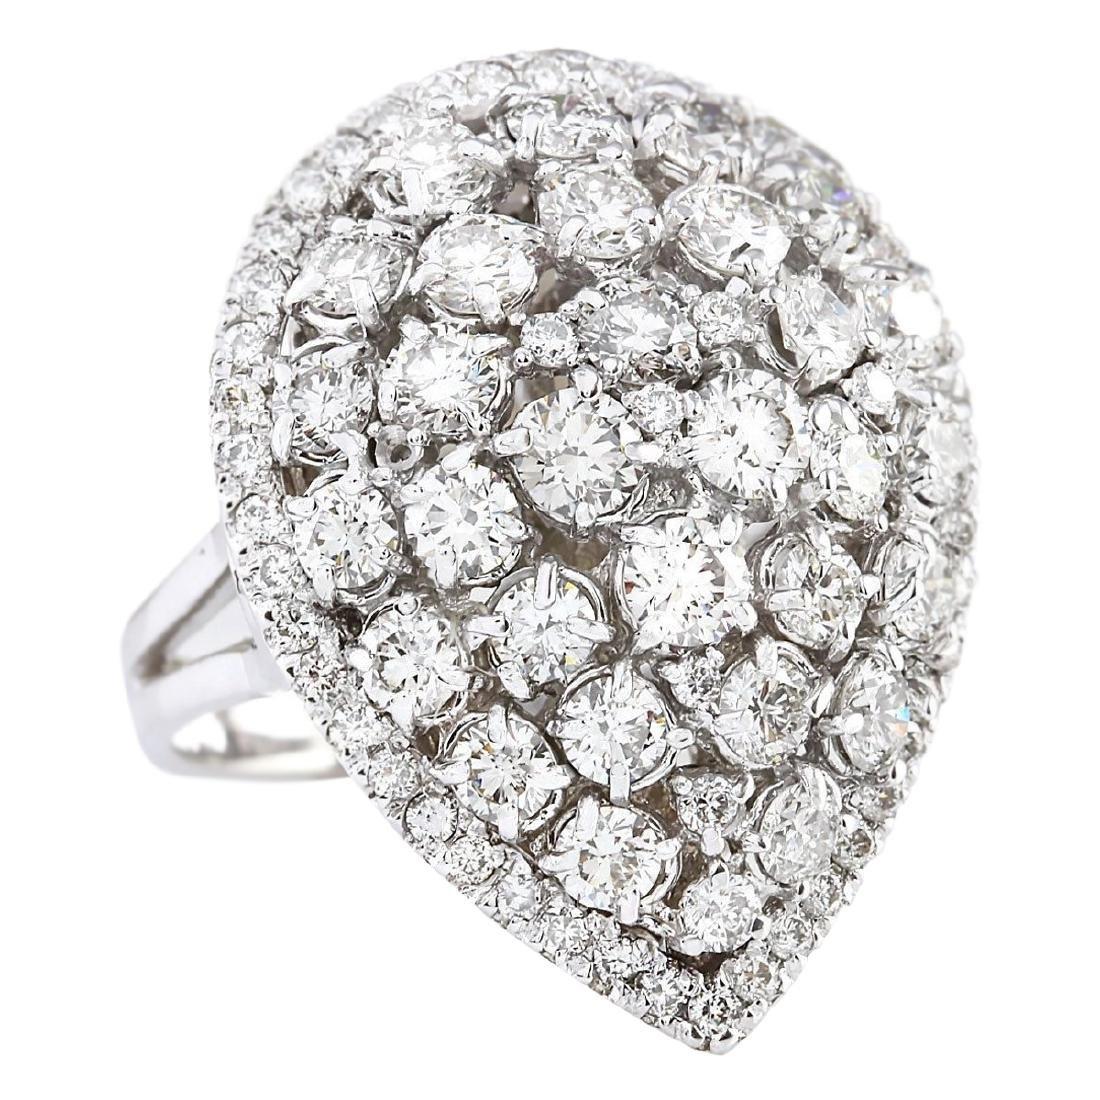 3.70 CTW Natural Diamond Ring In 18K White Gold - 2